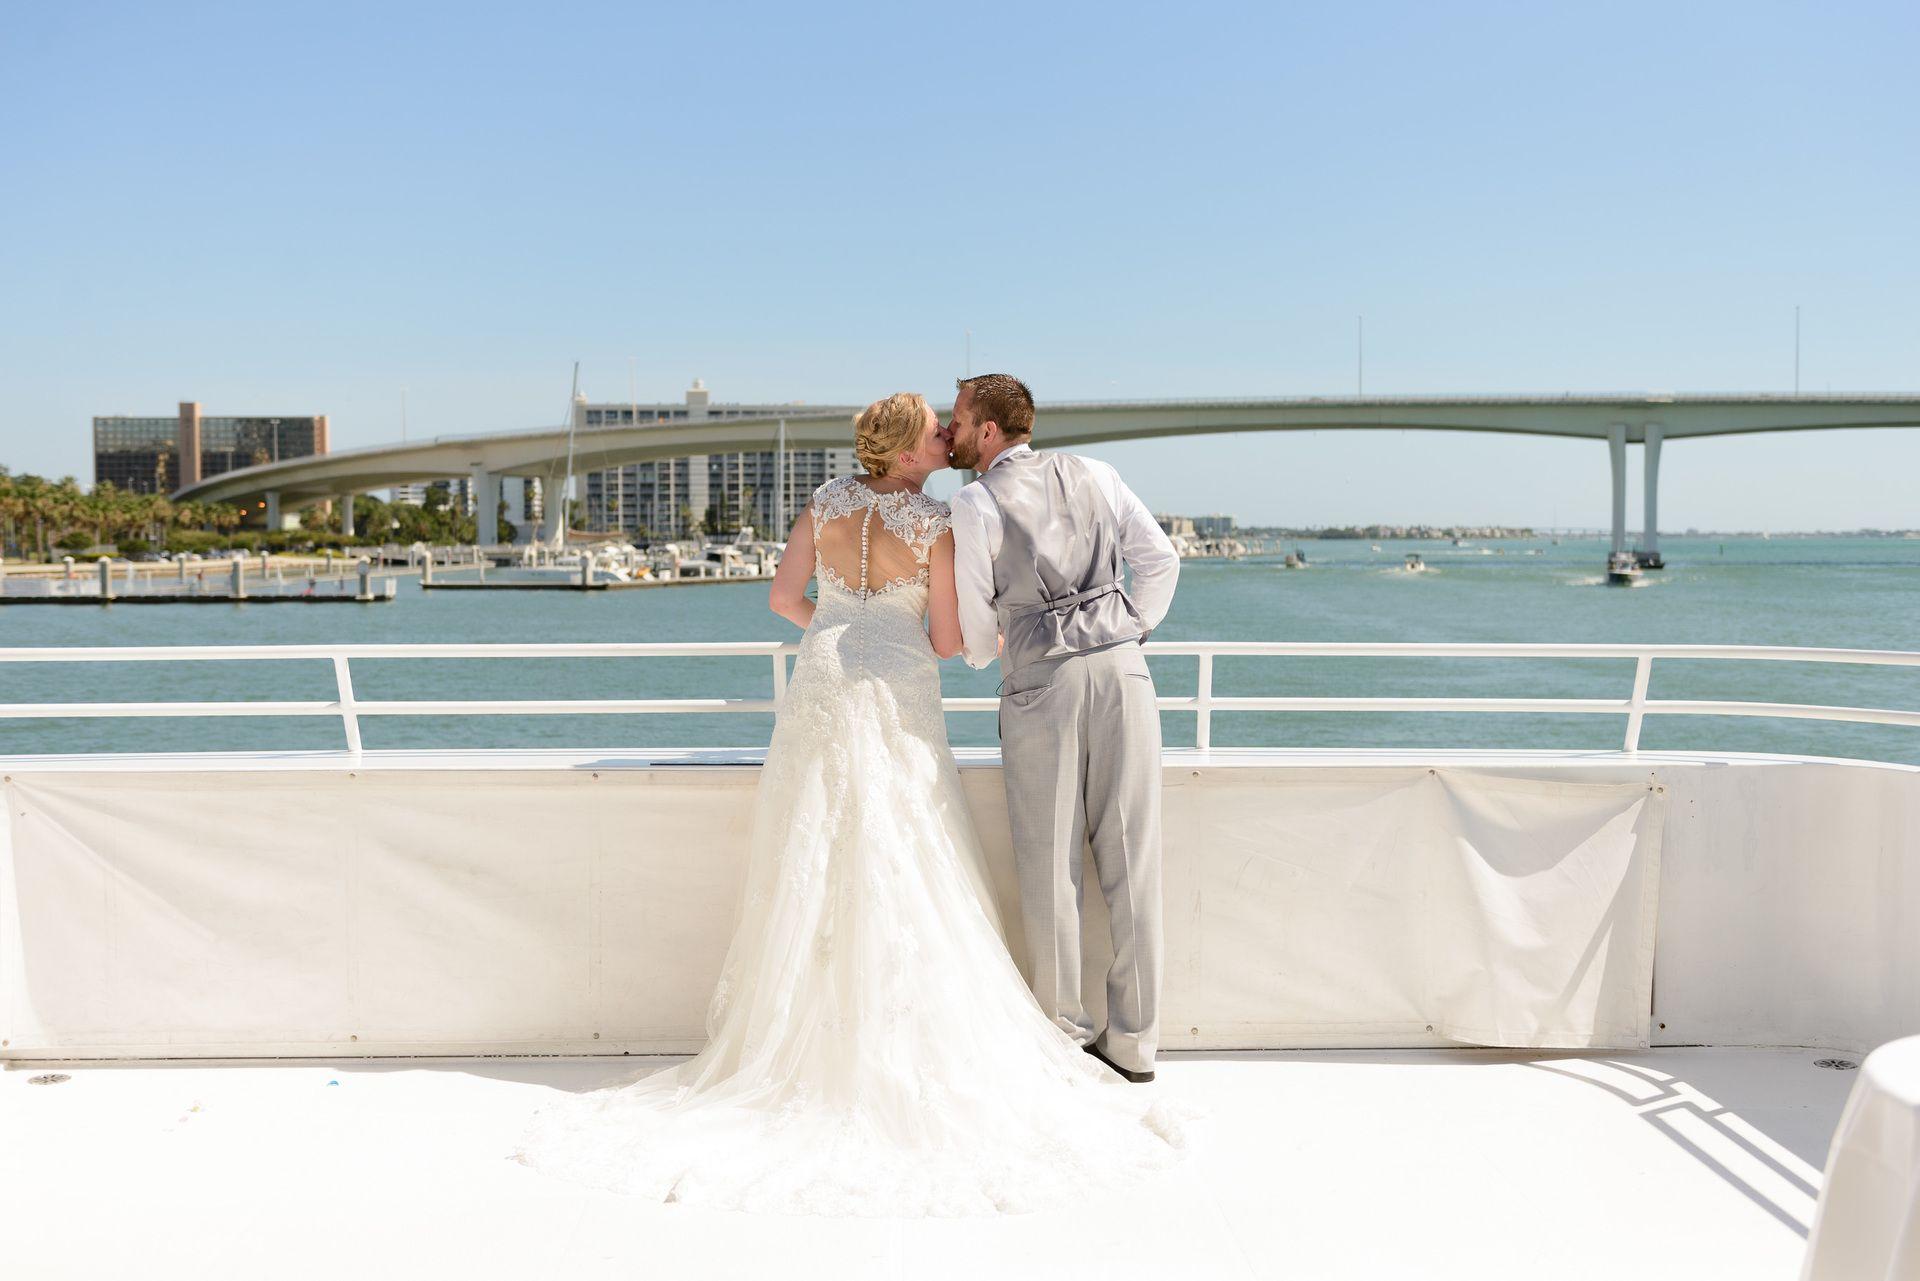 Nautical Spring Wedding at Yacht Starship Tampa, FL